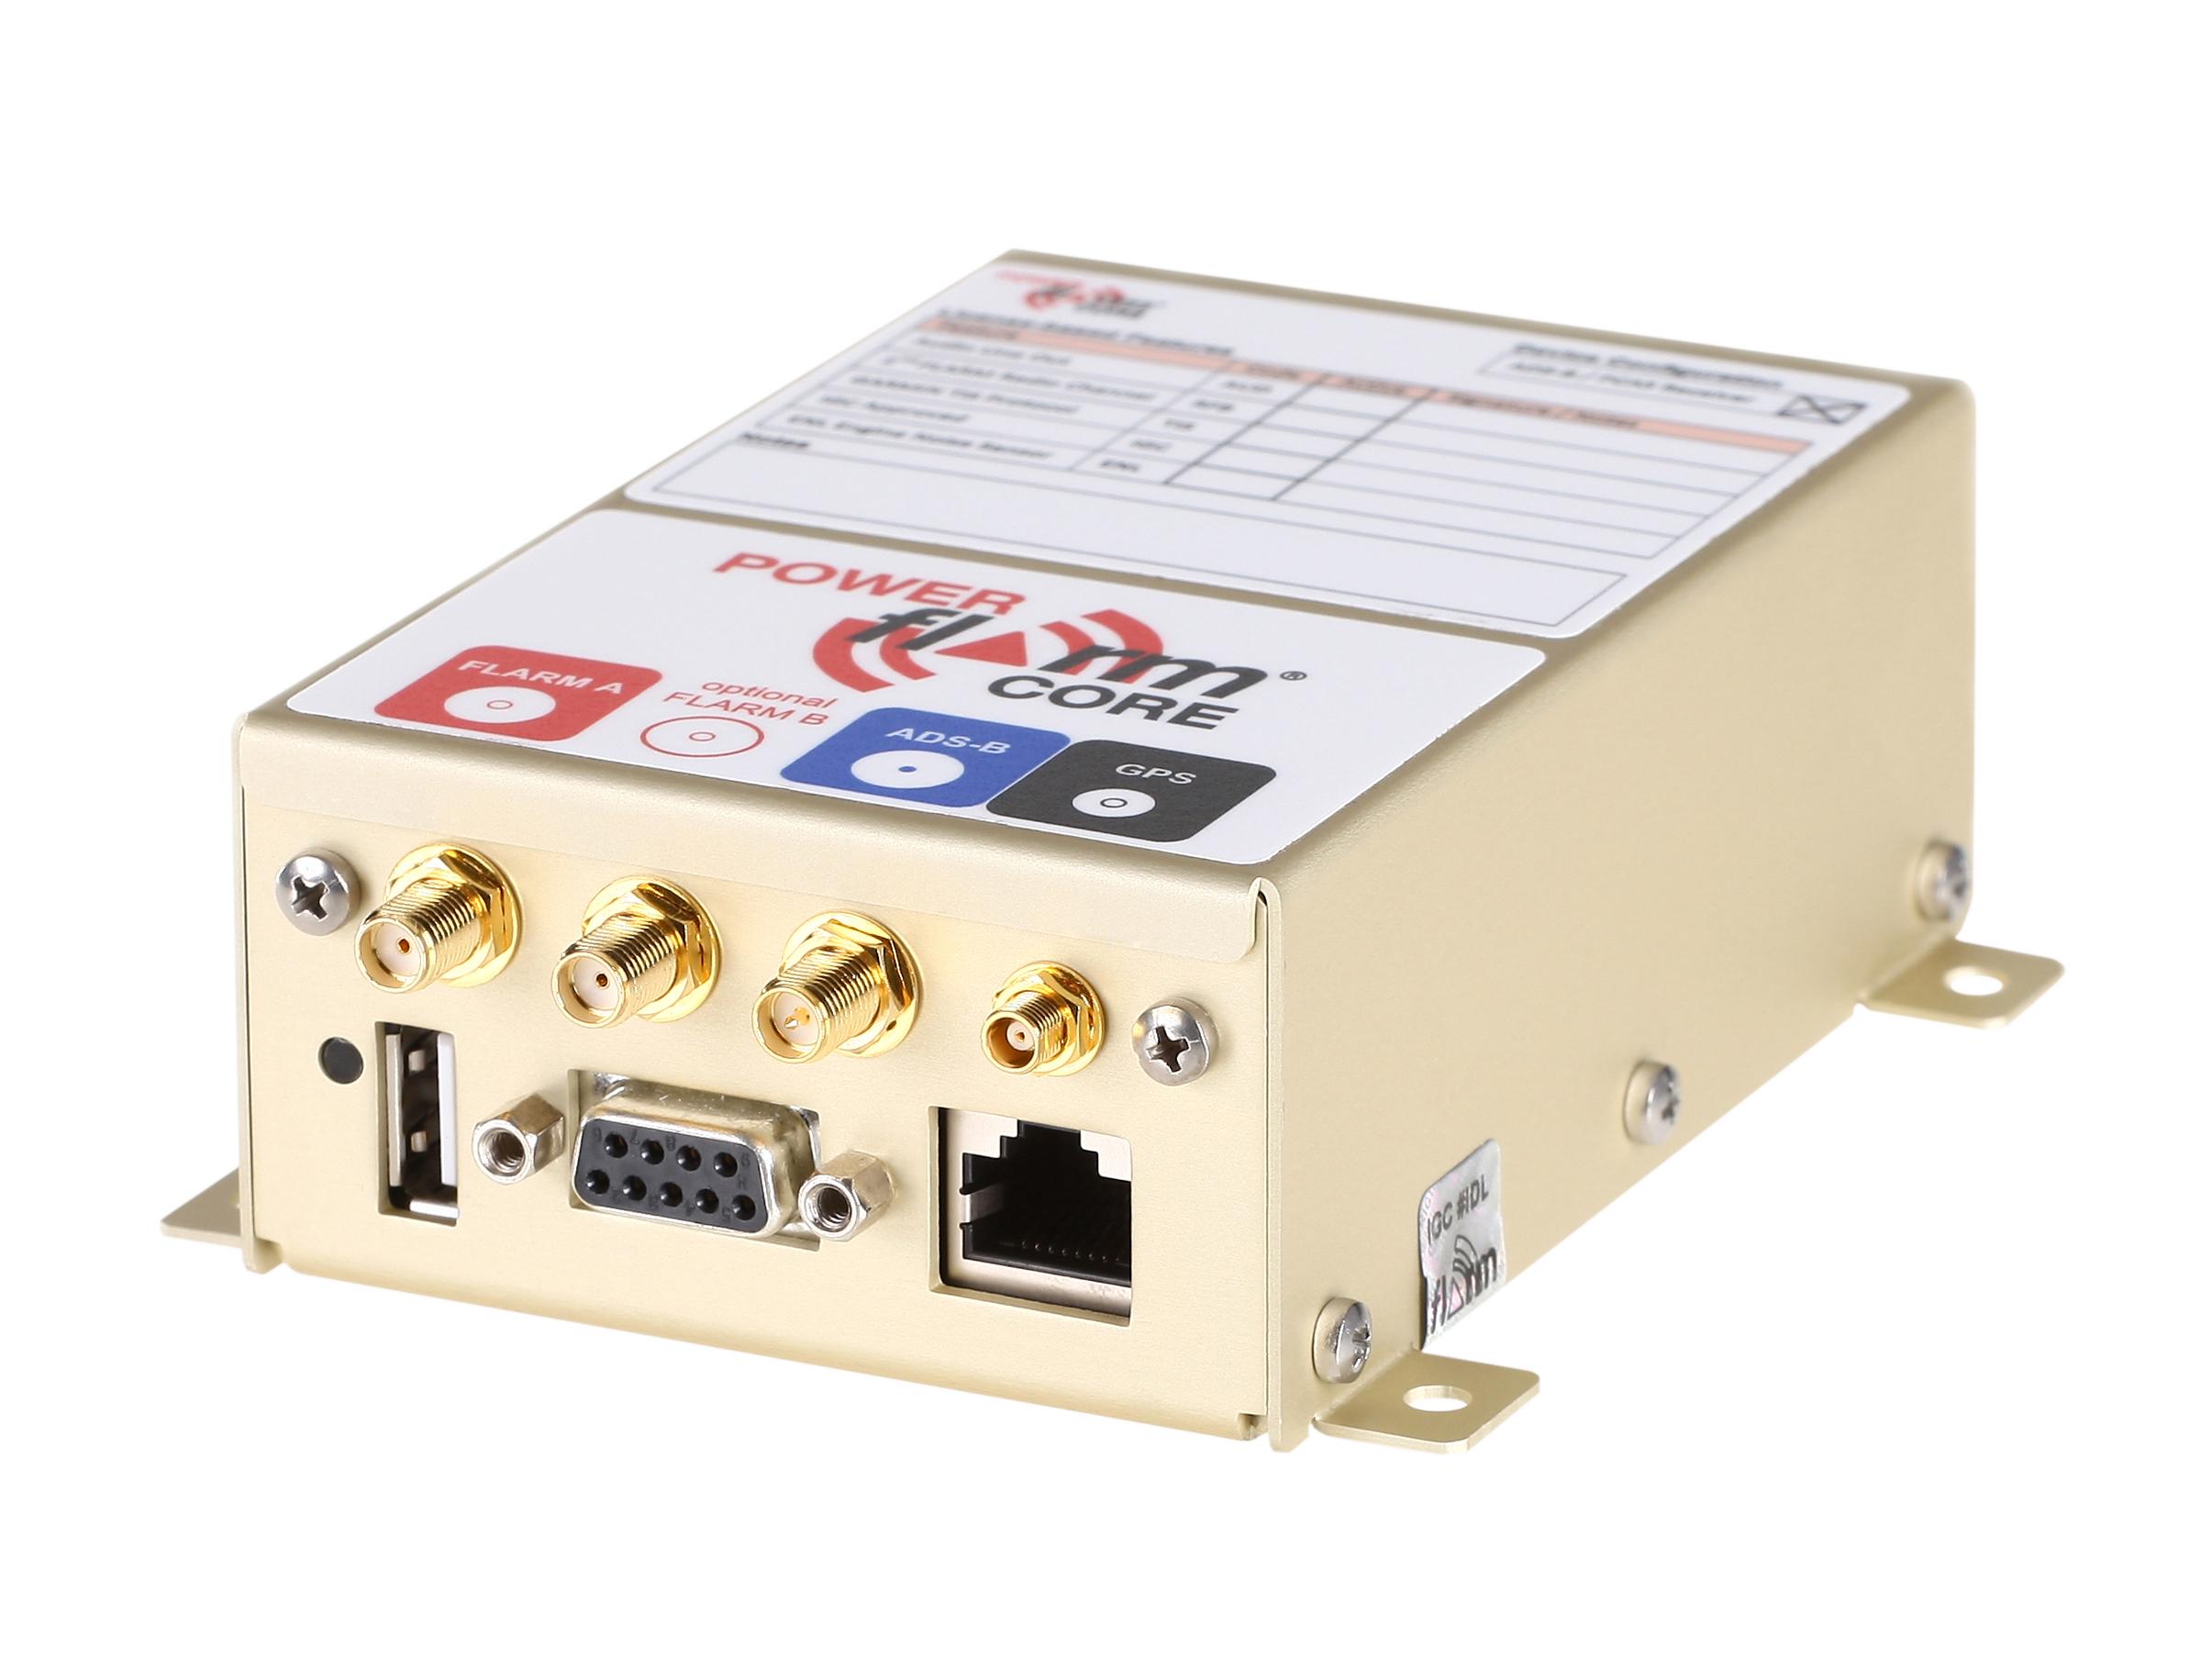 FLAPFC11A PowerFLARM Core ADS-B A-version